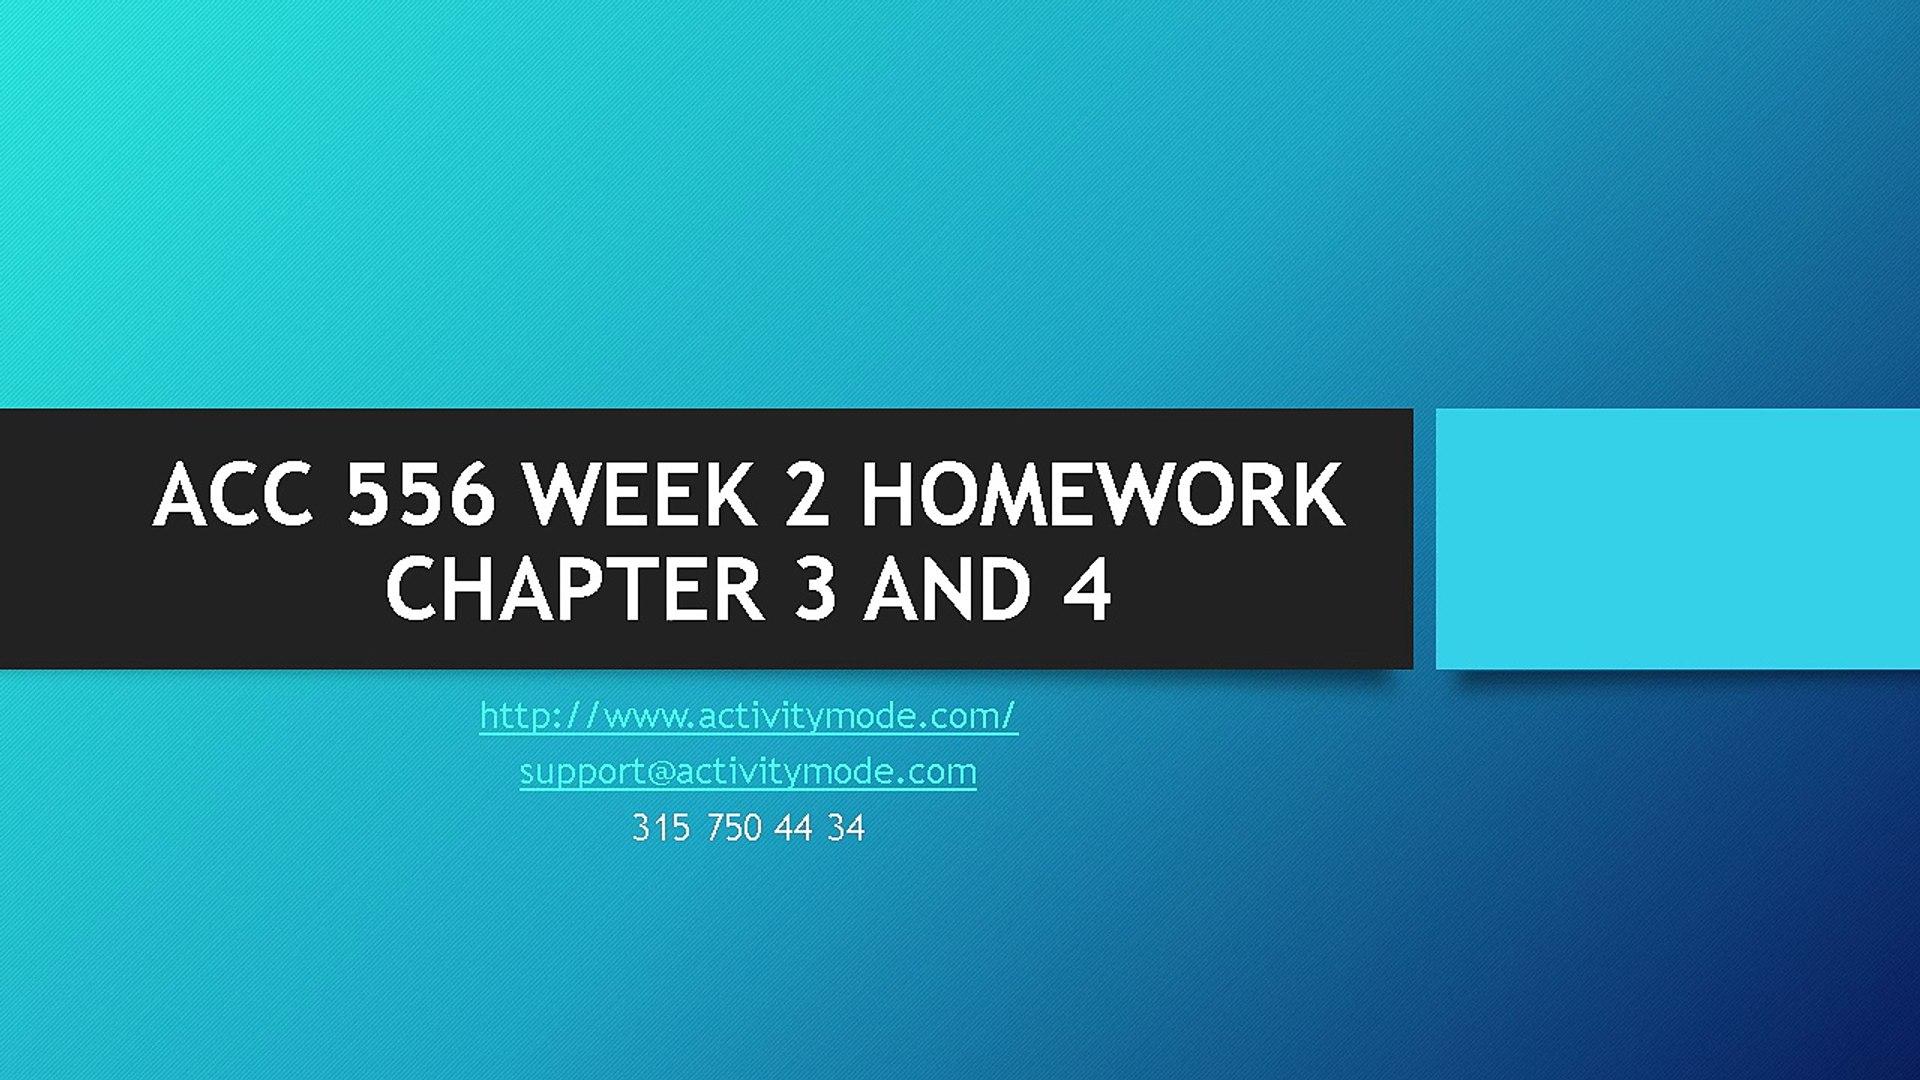 ACC 556 WEEK 2 HOMEWORK CHAPTER 3 AND 4